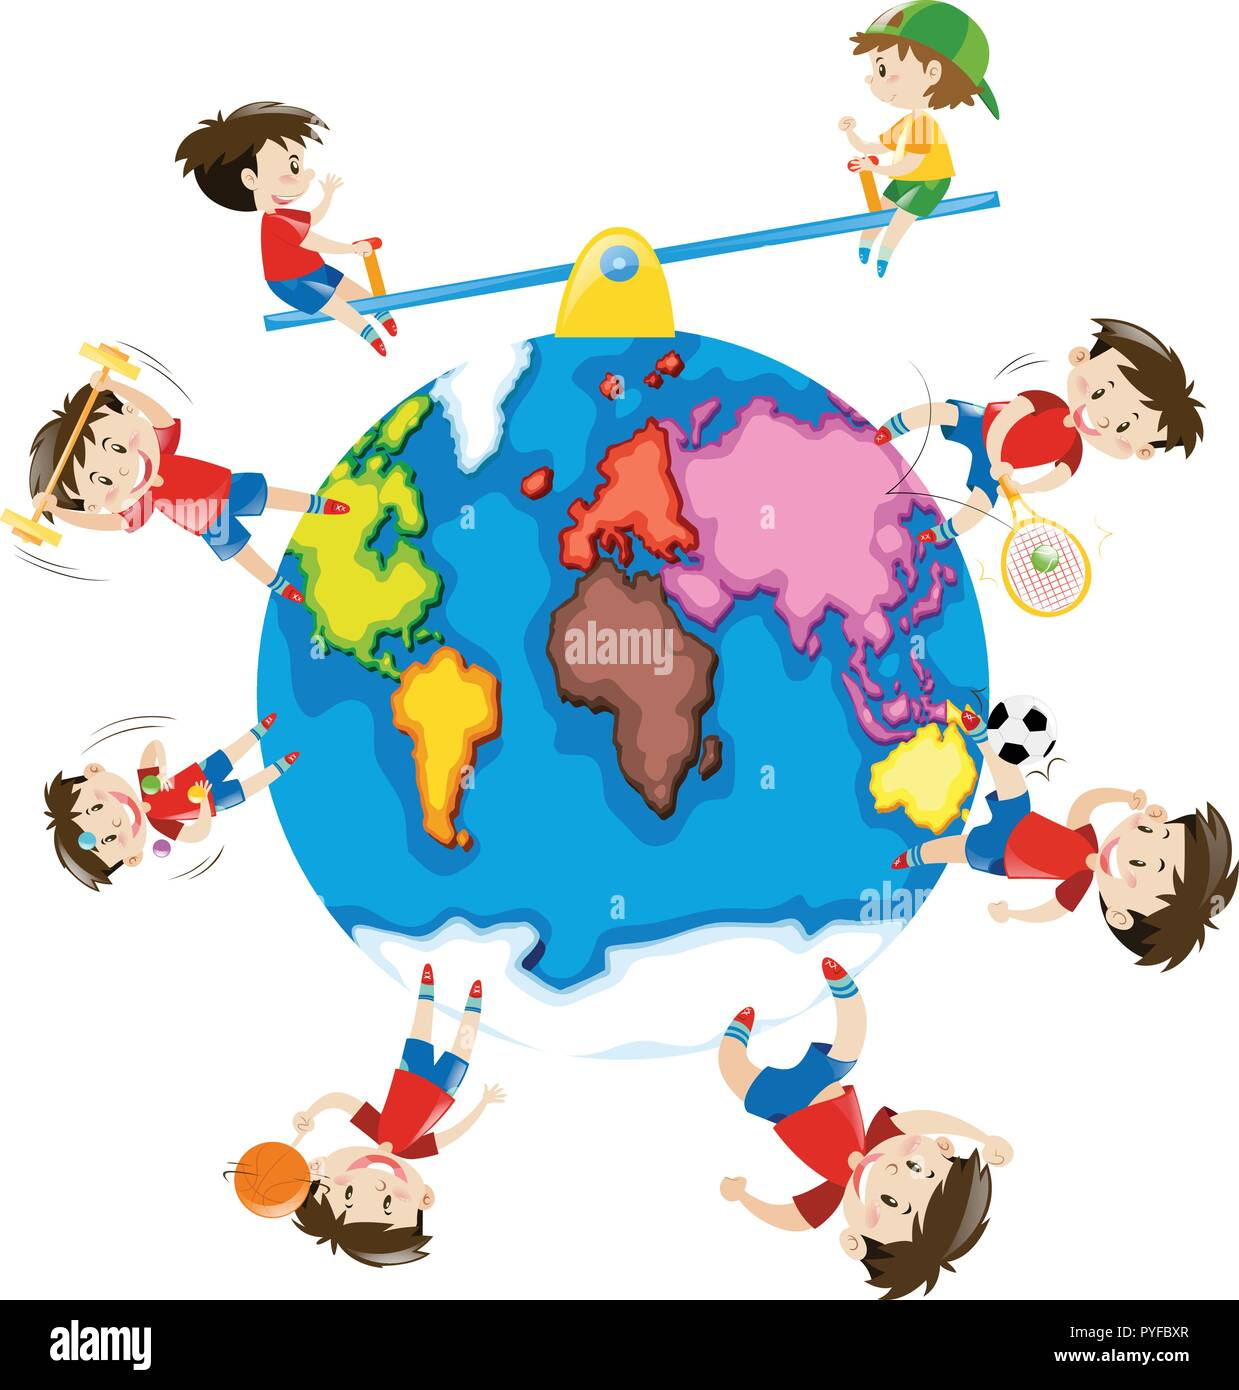 Boy doing different activities around the world illustration - Stock Image